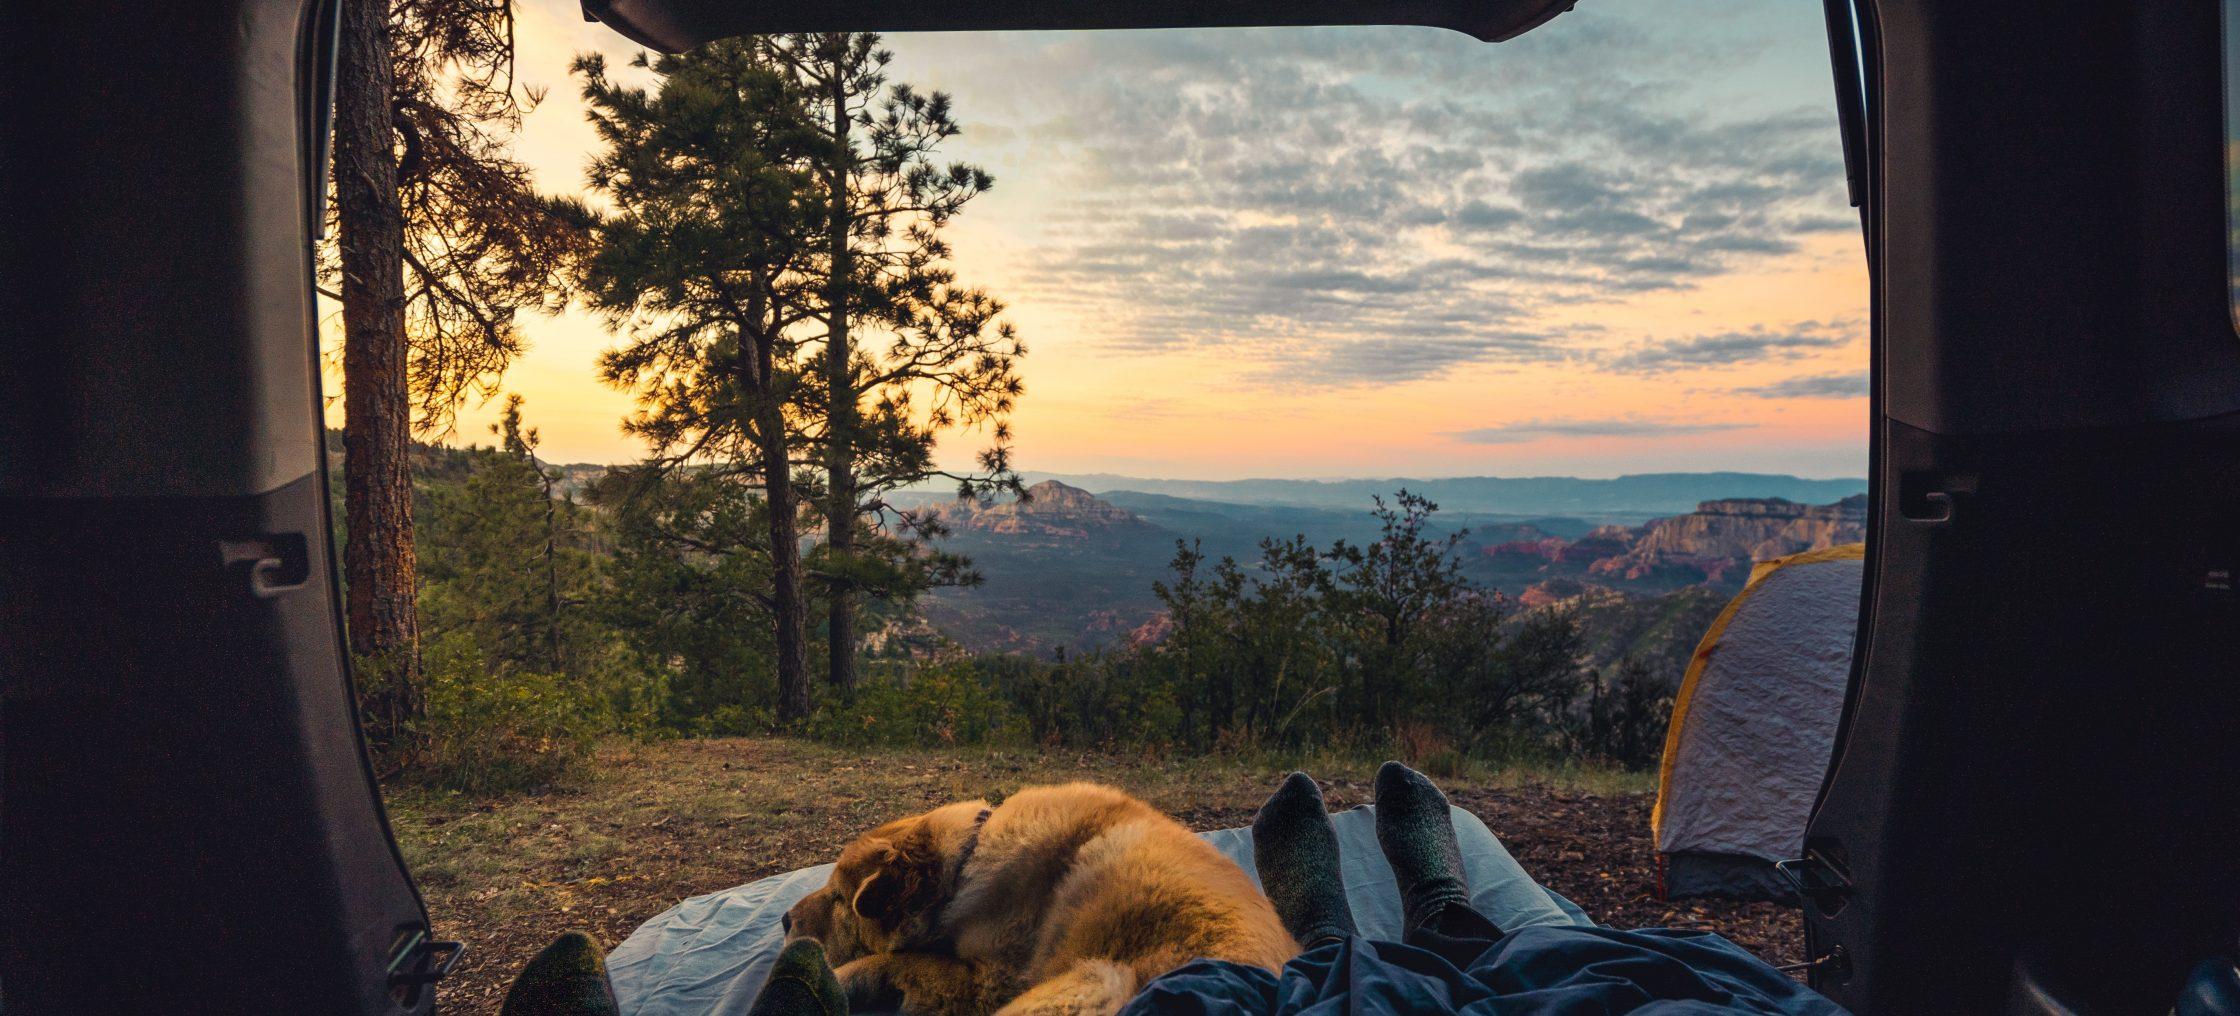 hund camping verhalten camper scaled